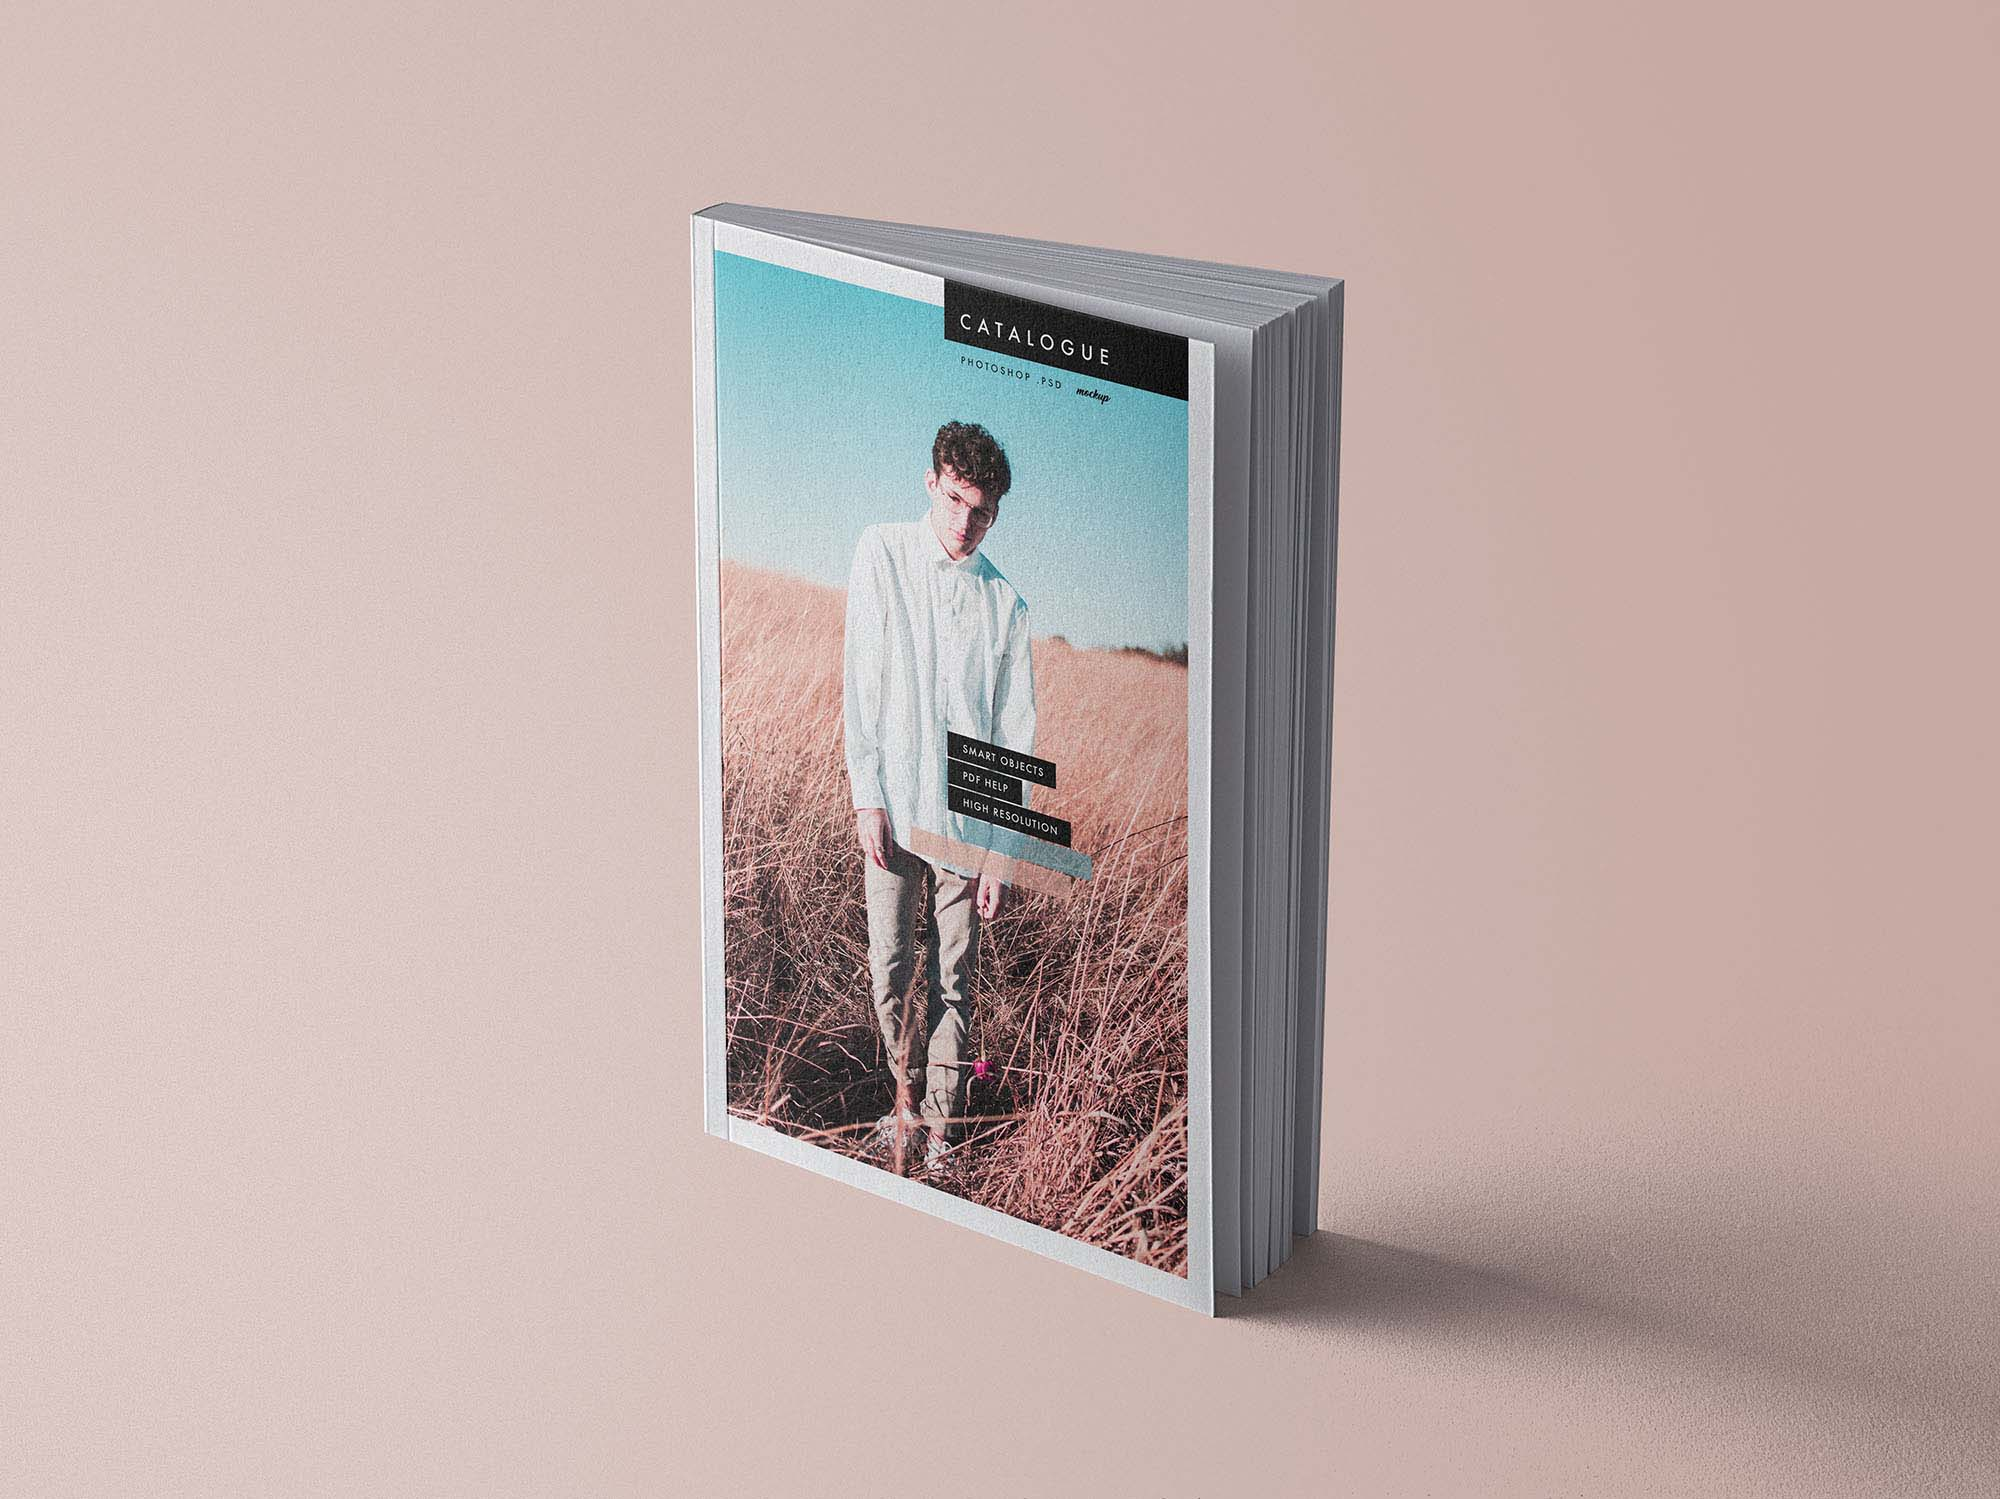 Free Catalog Book Mockup (PSD)